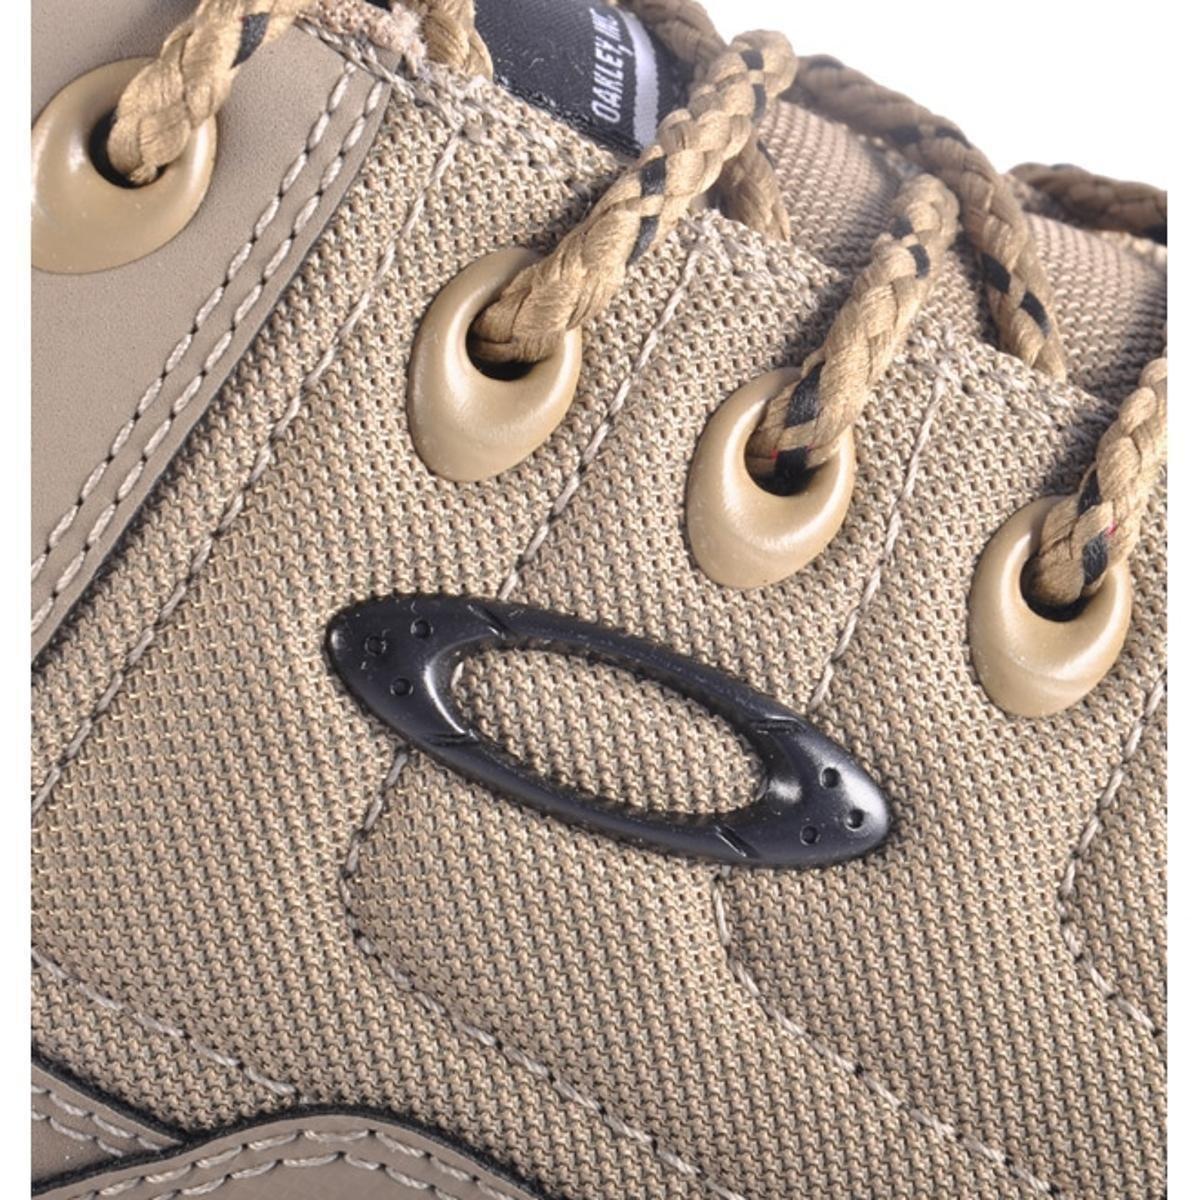 Tênis Oakley Halftrack Low - Bege - Compre Agora   Netshoes 25ffea4ec8